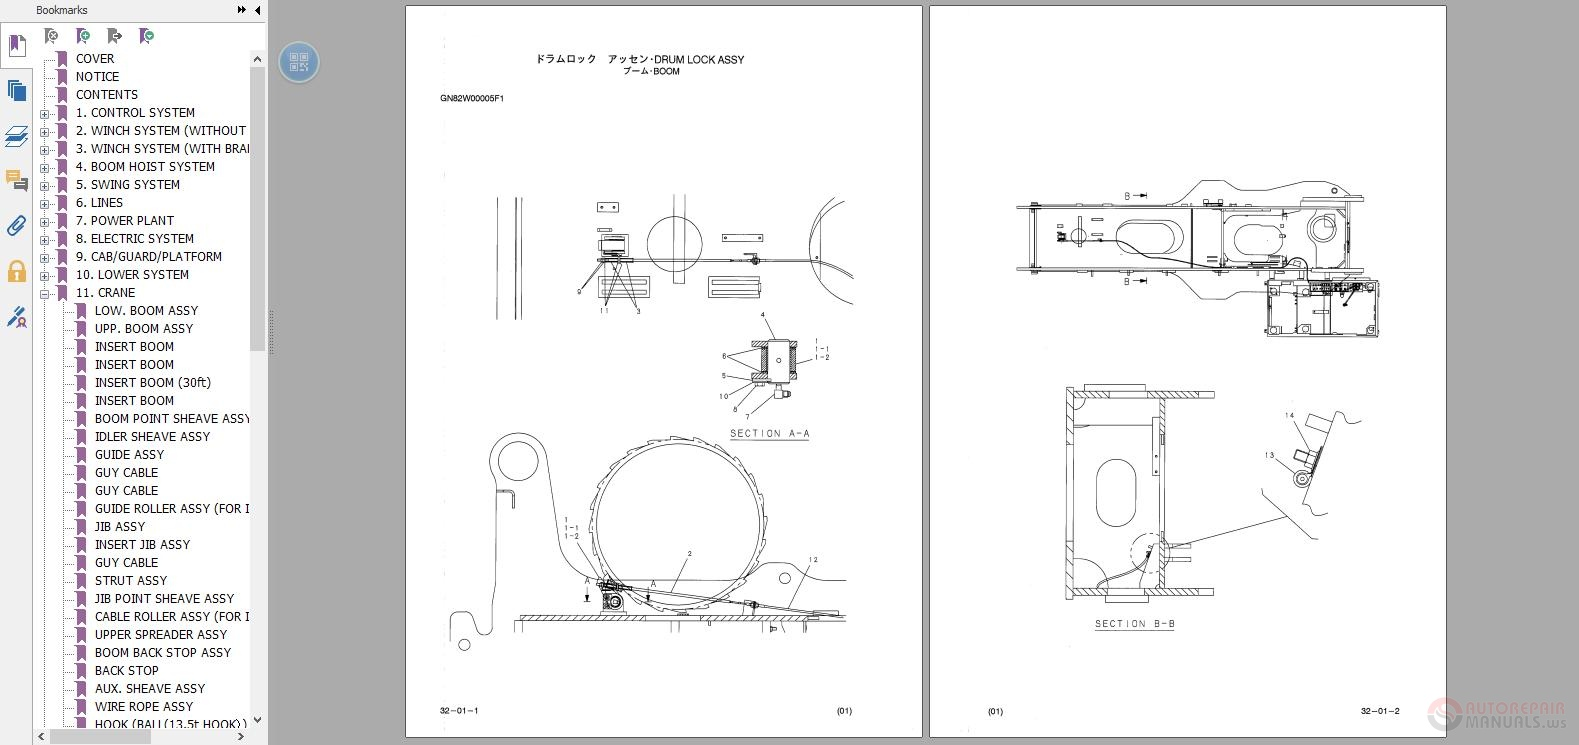 Kobelco Sk210 Parts Manual Dota 2 Info Wallpaper Wiring Diagram Bienvenidos Mecanicosdz Manuales De Reparacion